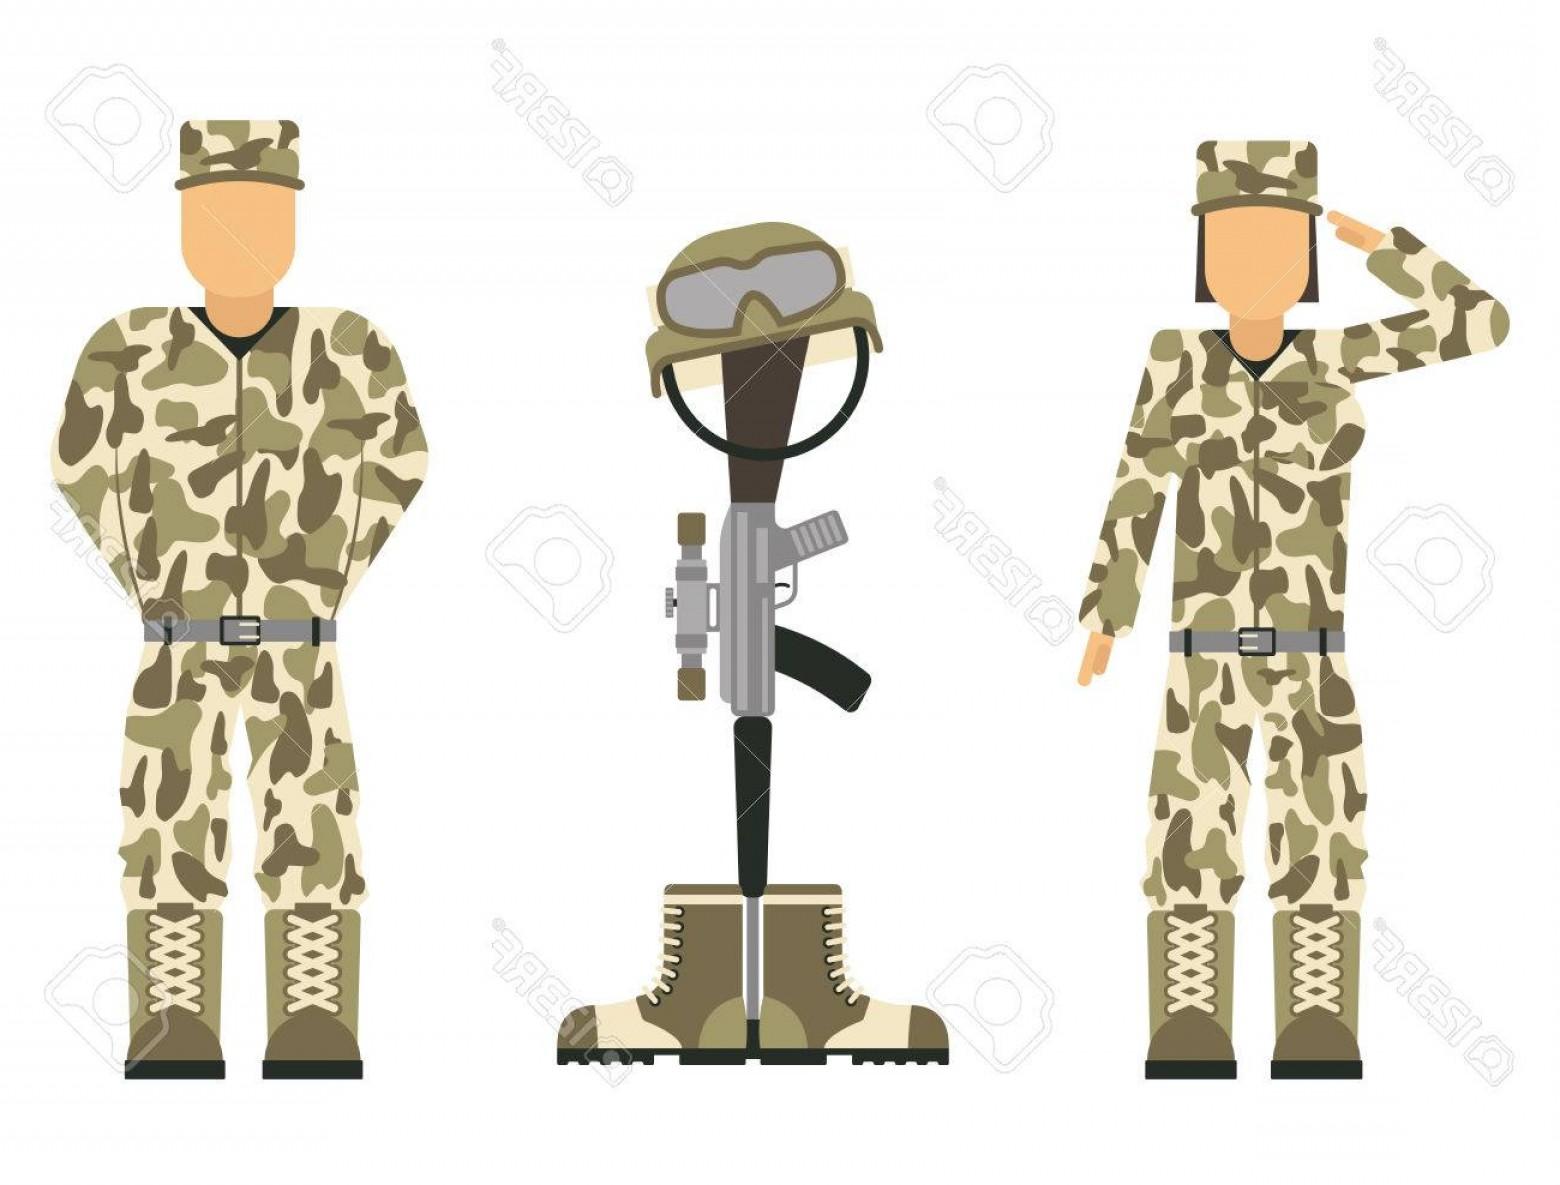 1560x1185 Photostock Vector Memorial Battlefield Cross American Honor Symbol